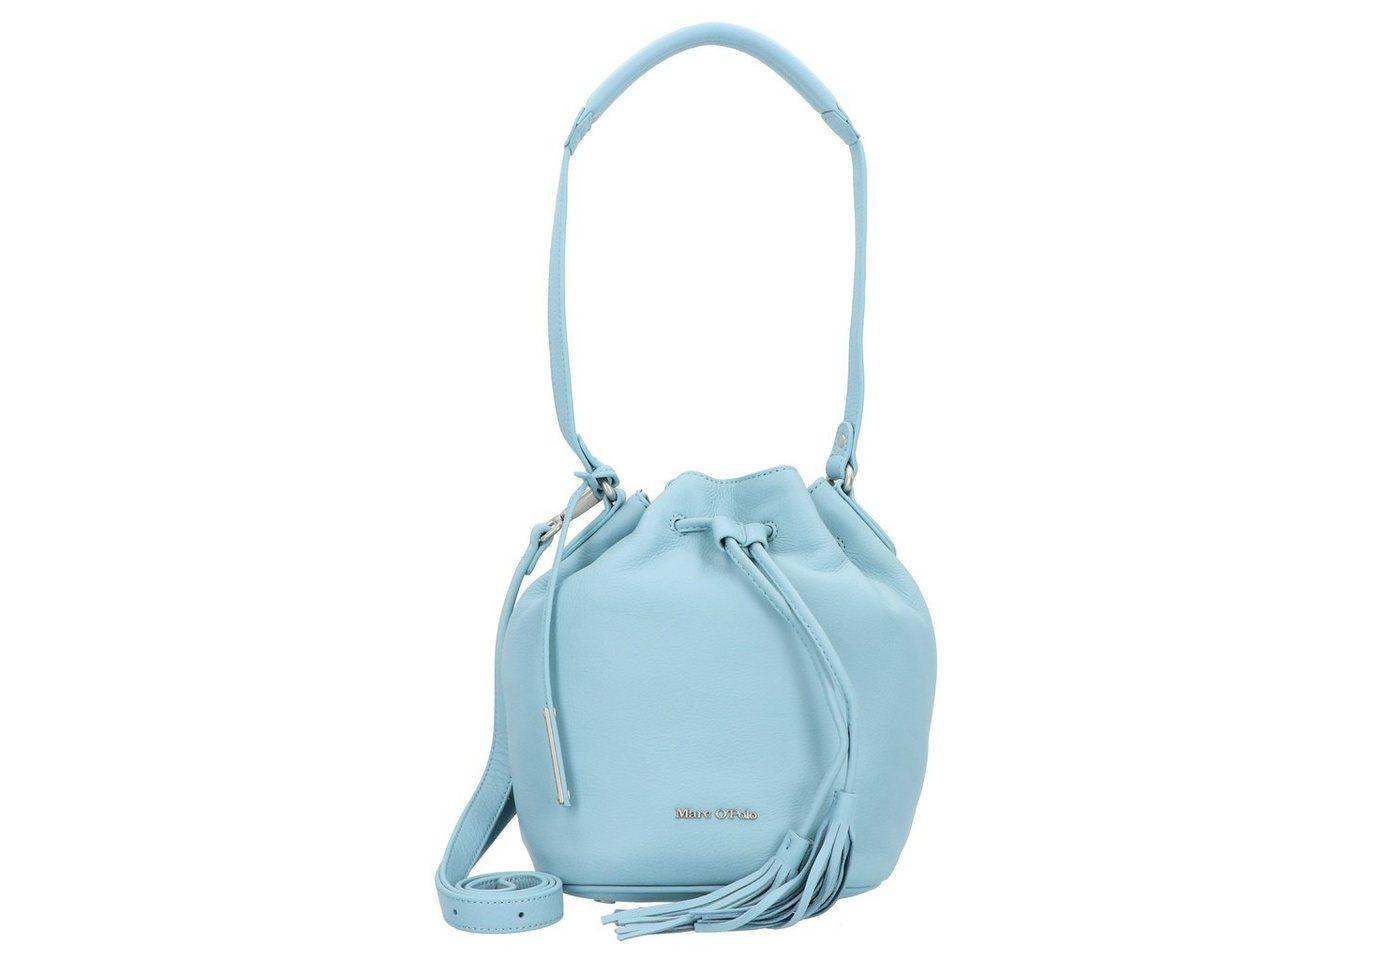 Marc O´Polo Billa Beuteltasche Leder 19 cm | Taschen > Handtaschen > Beuteltaschen | Blau | Marc O´Polo